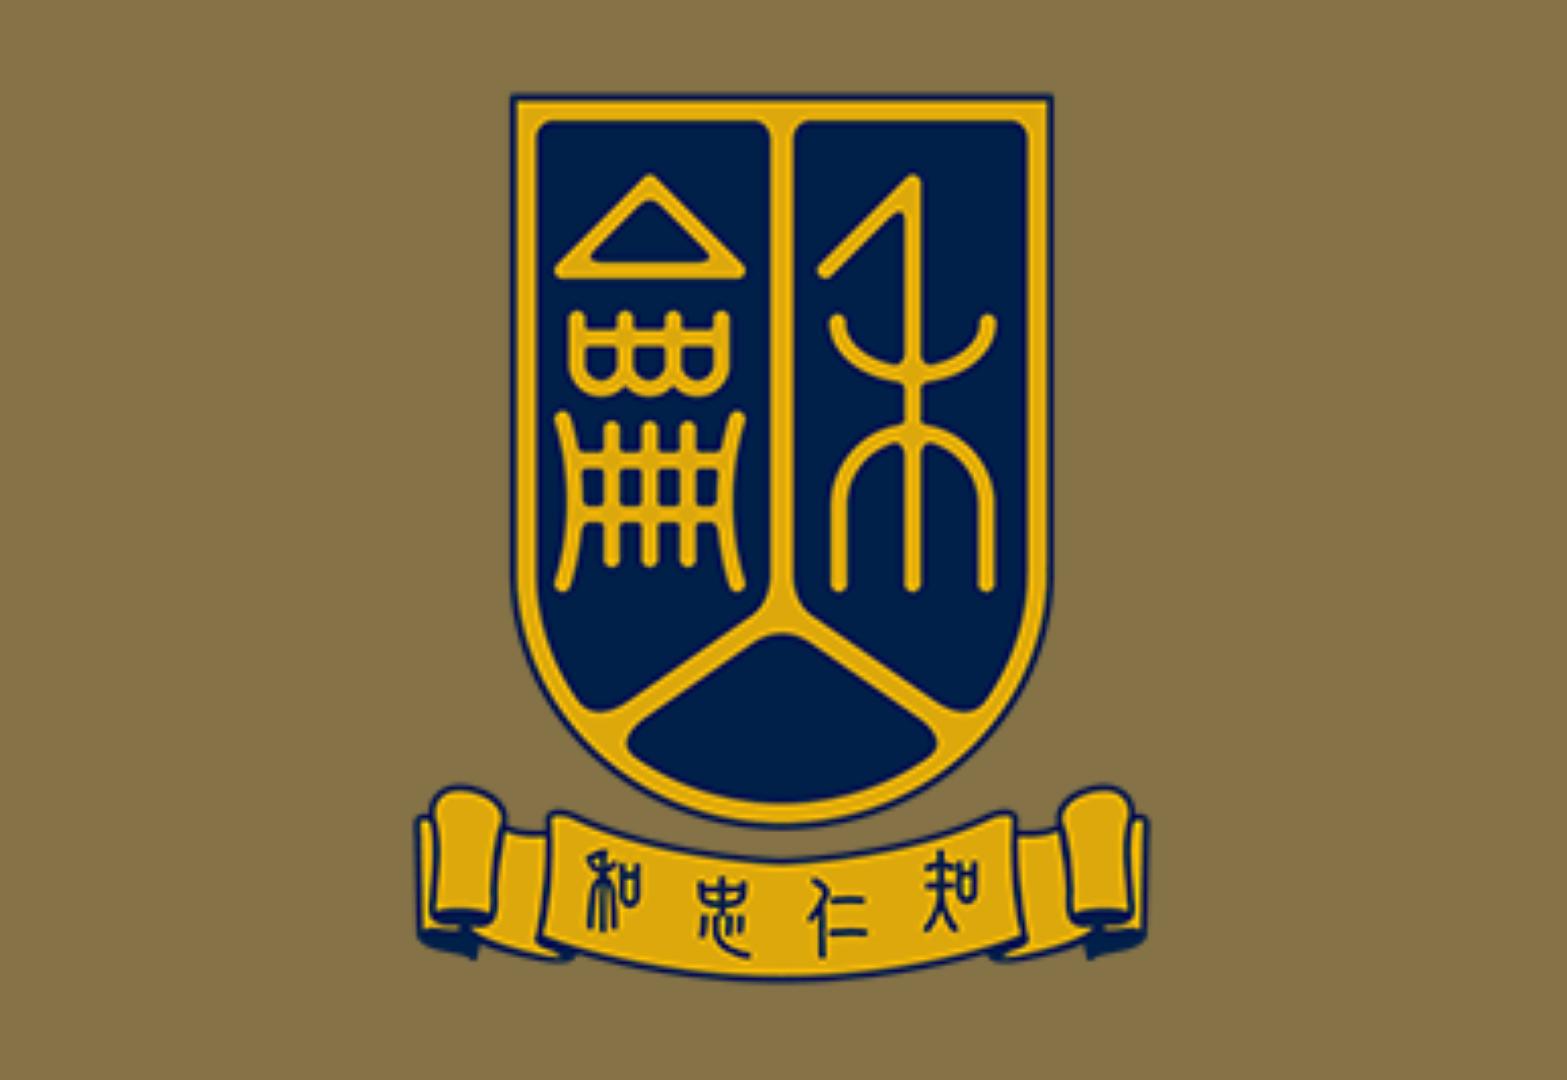 Prof. Oi-Lam NG 吳藹藍教授